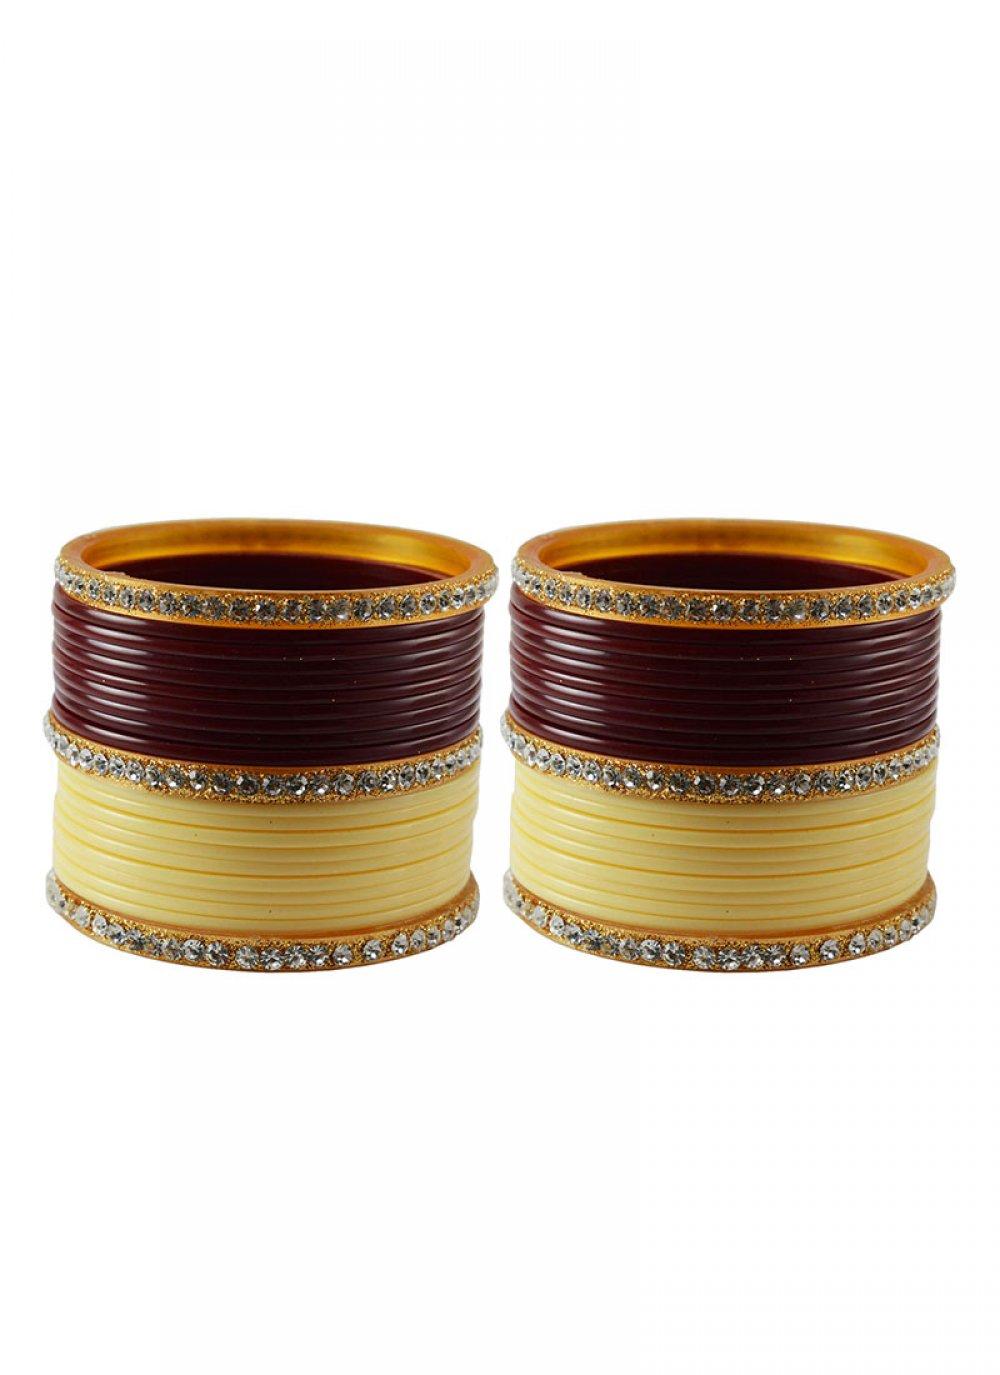 Maroon Color Bangles